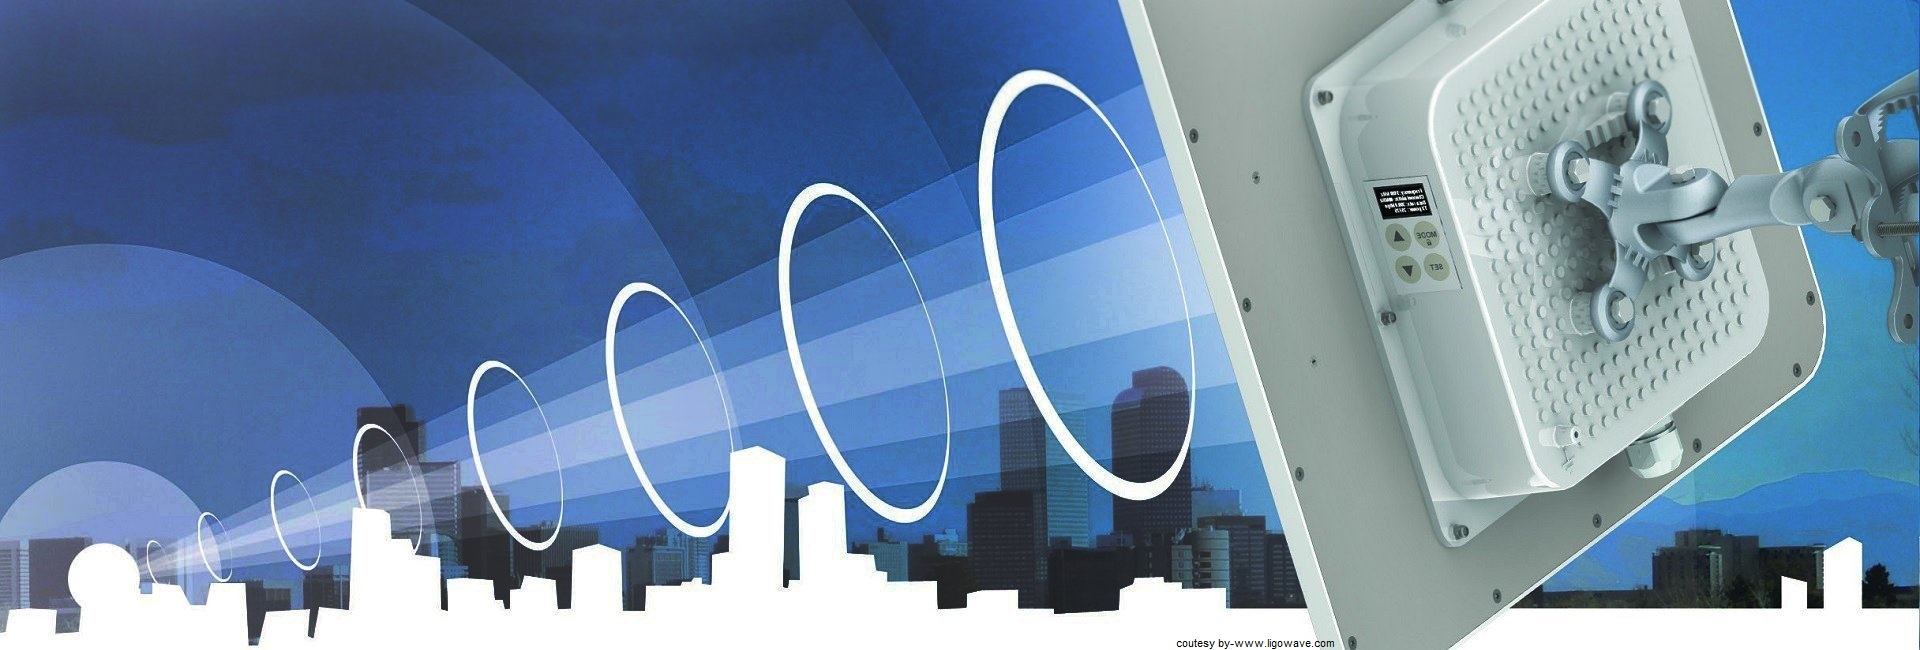 enterprise-wireless-solutions